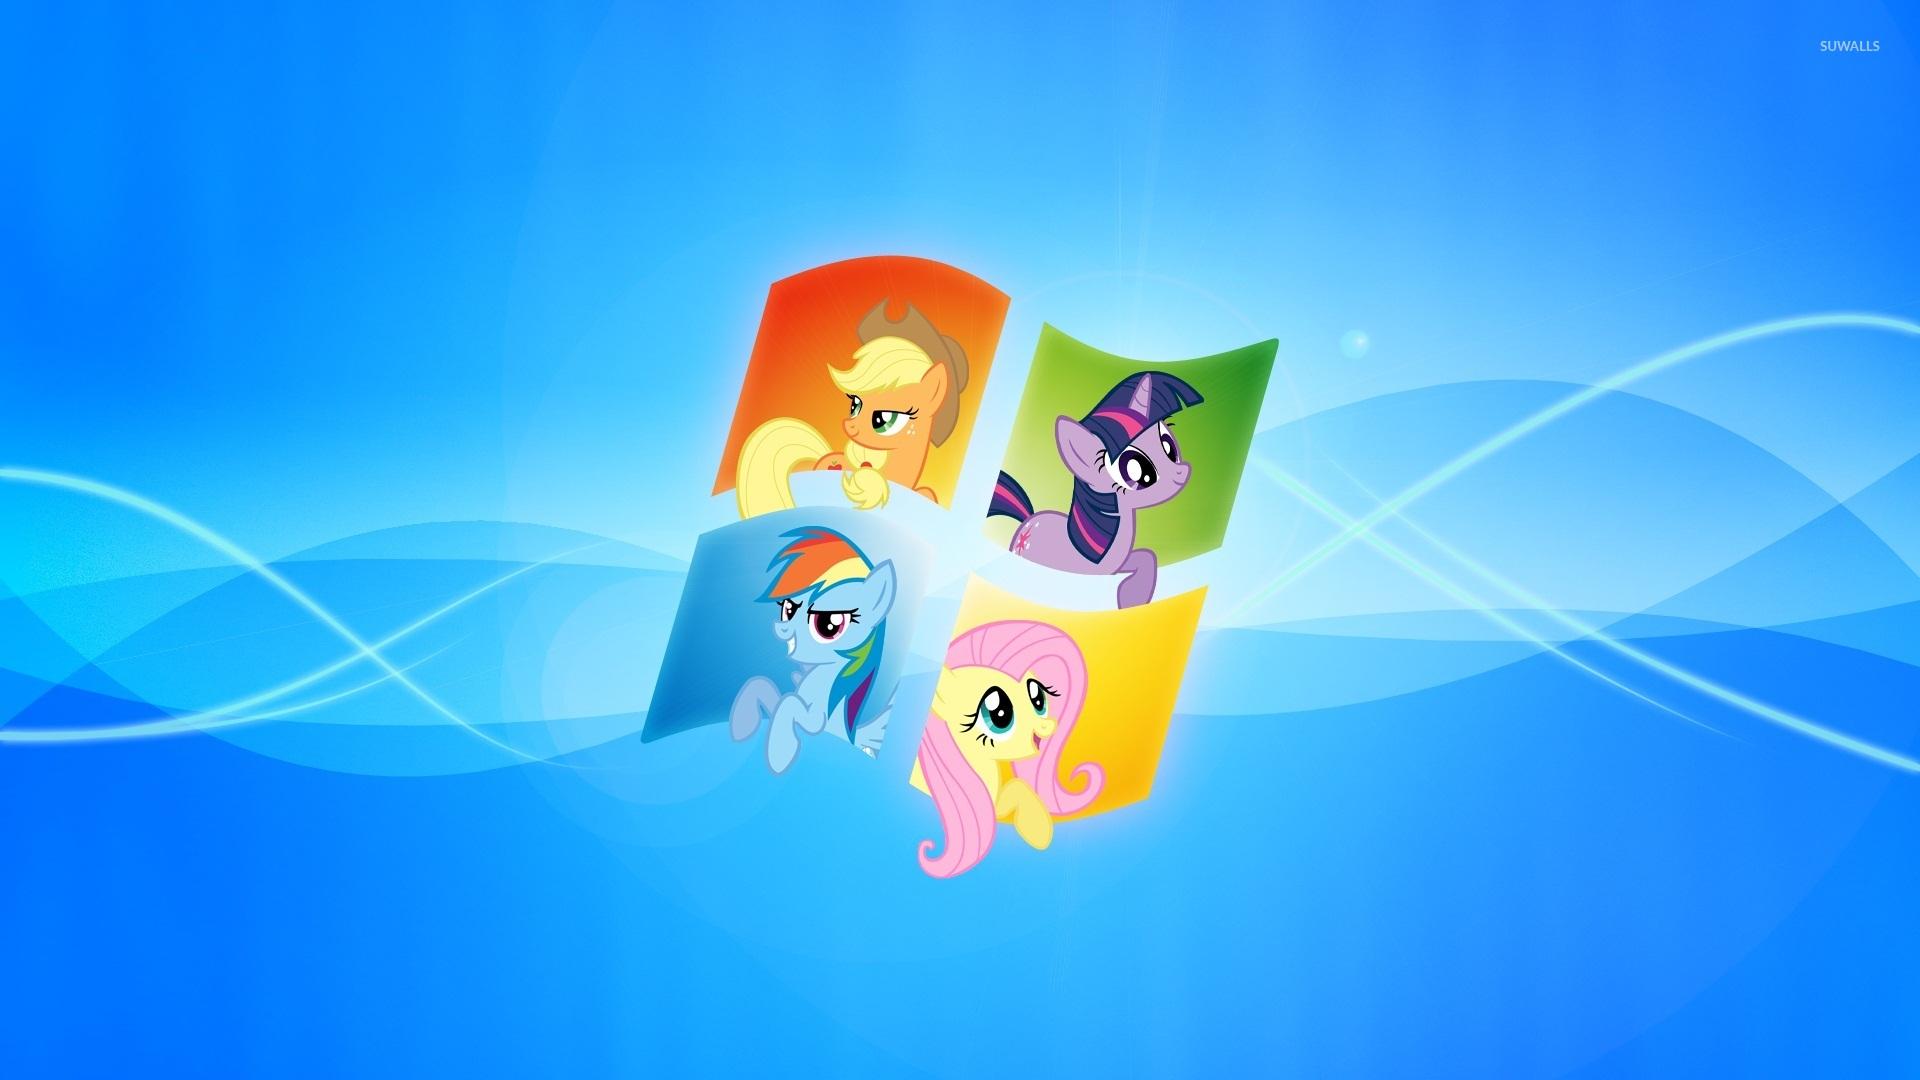 My Little Pony inside Windows wallpaper   Computer wallpapers   42636 1920x1080